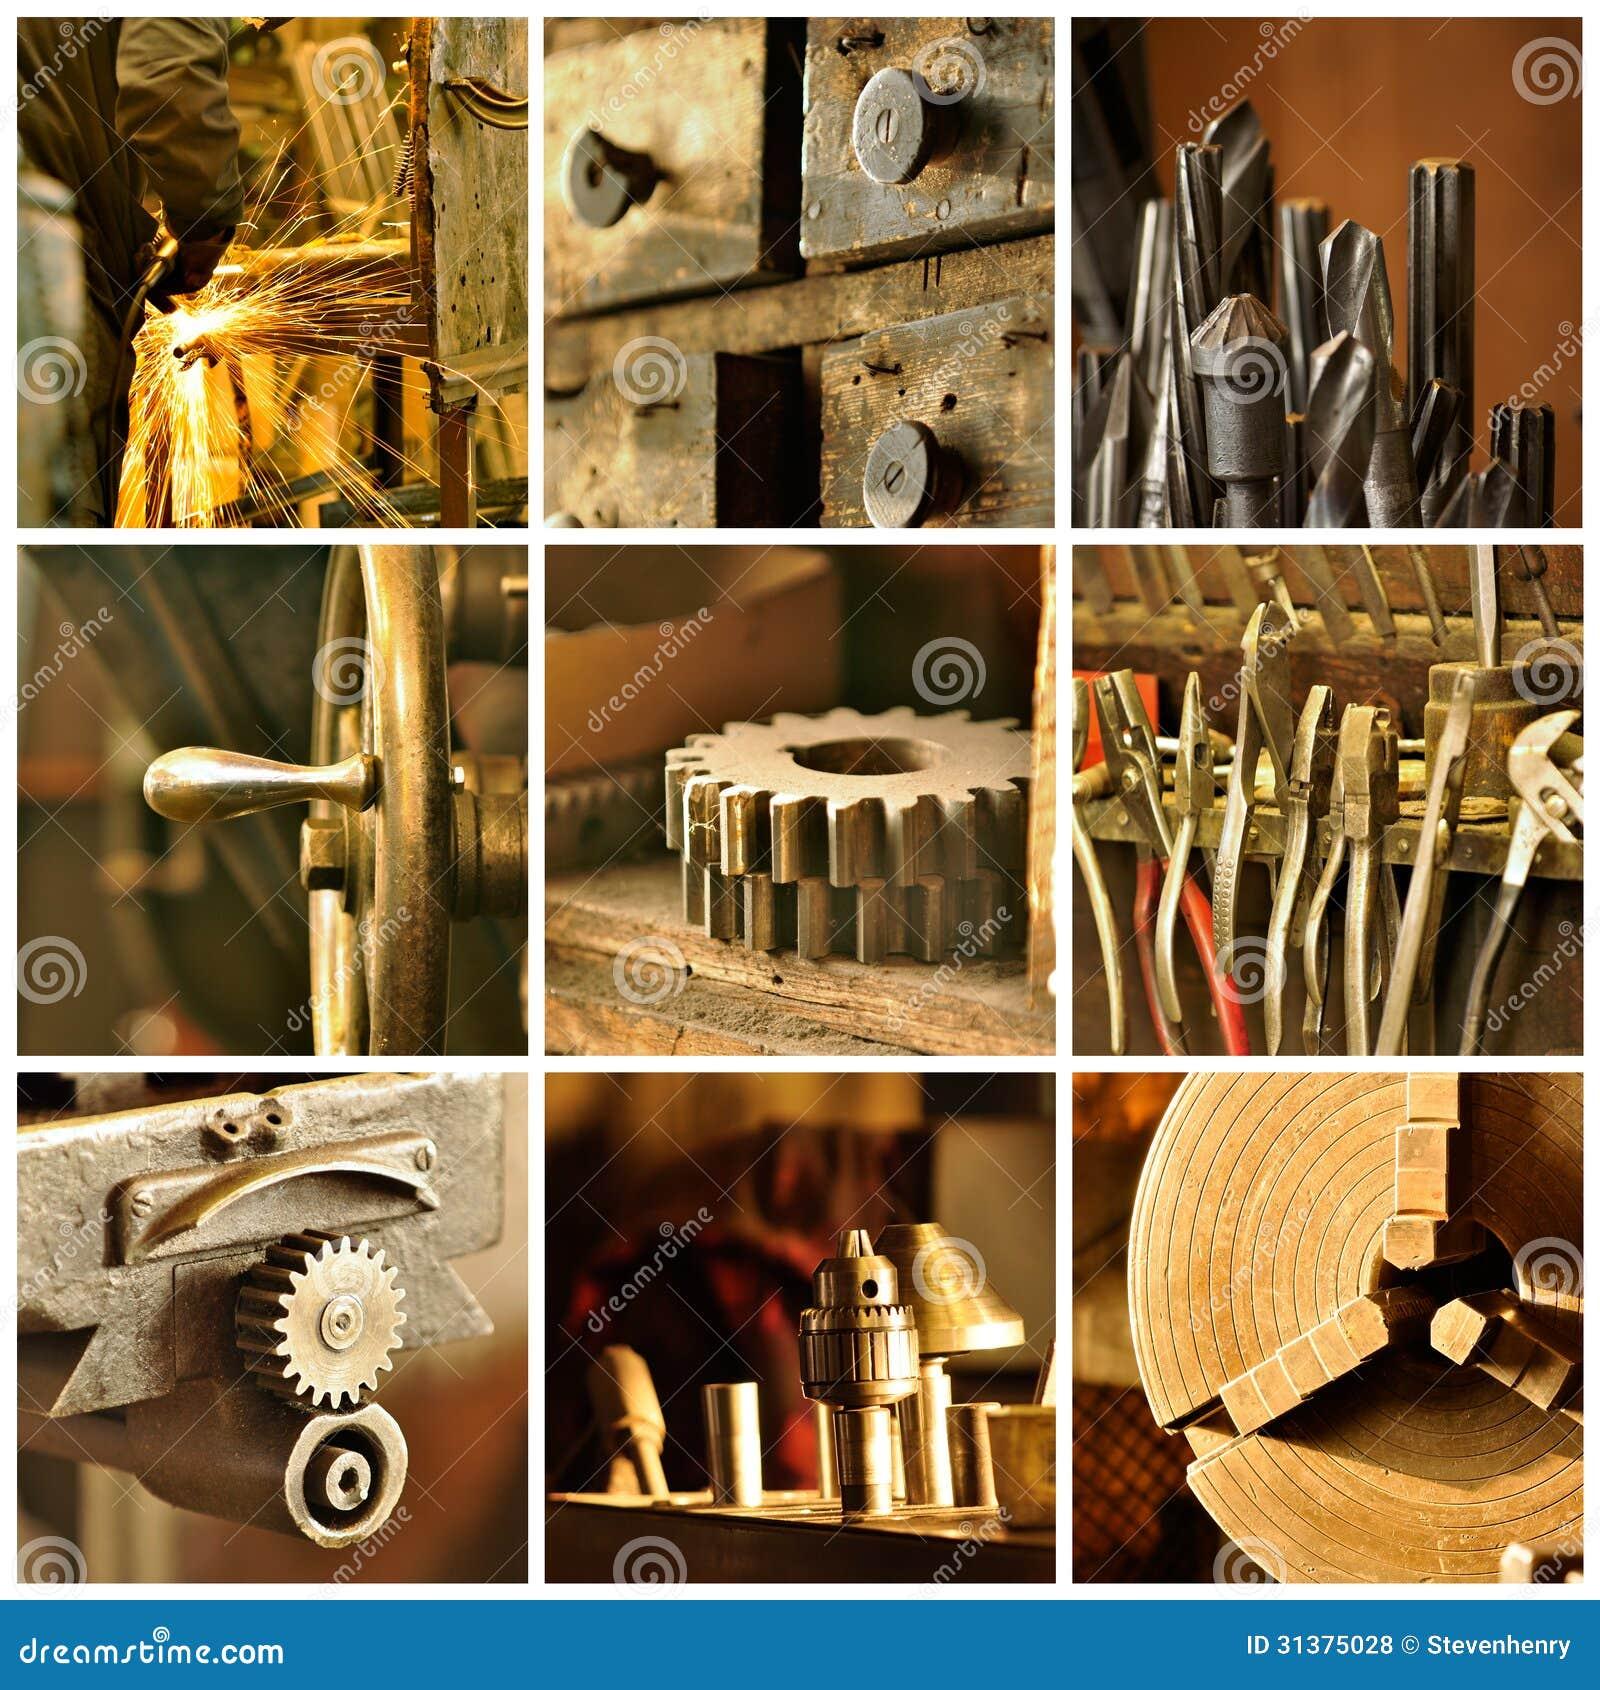 la machine shop